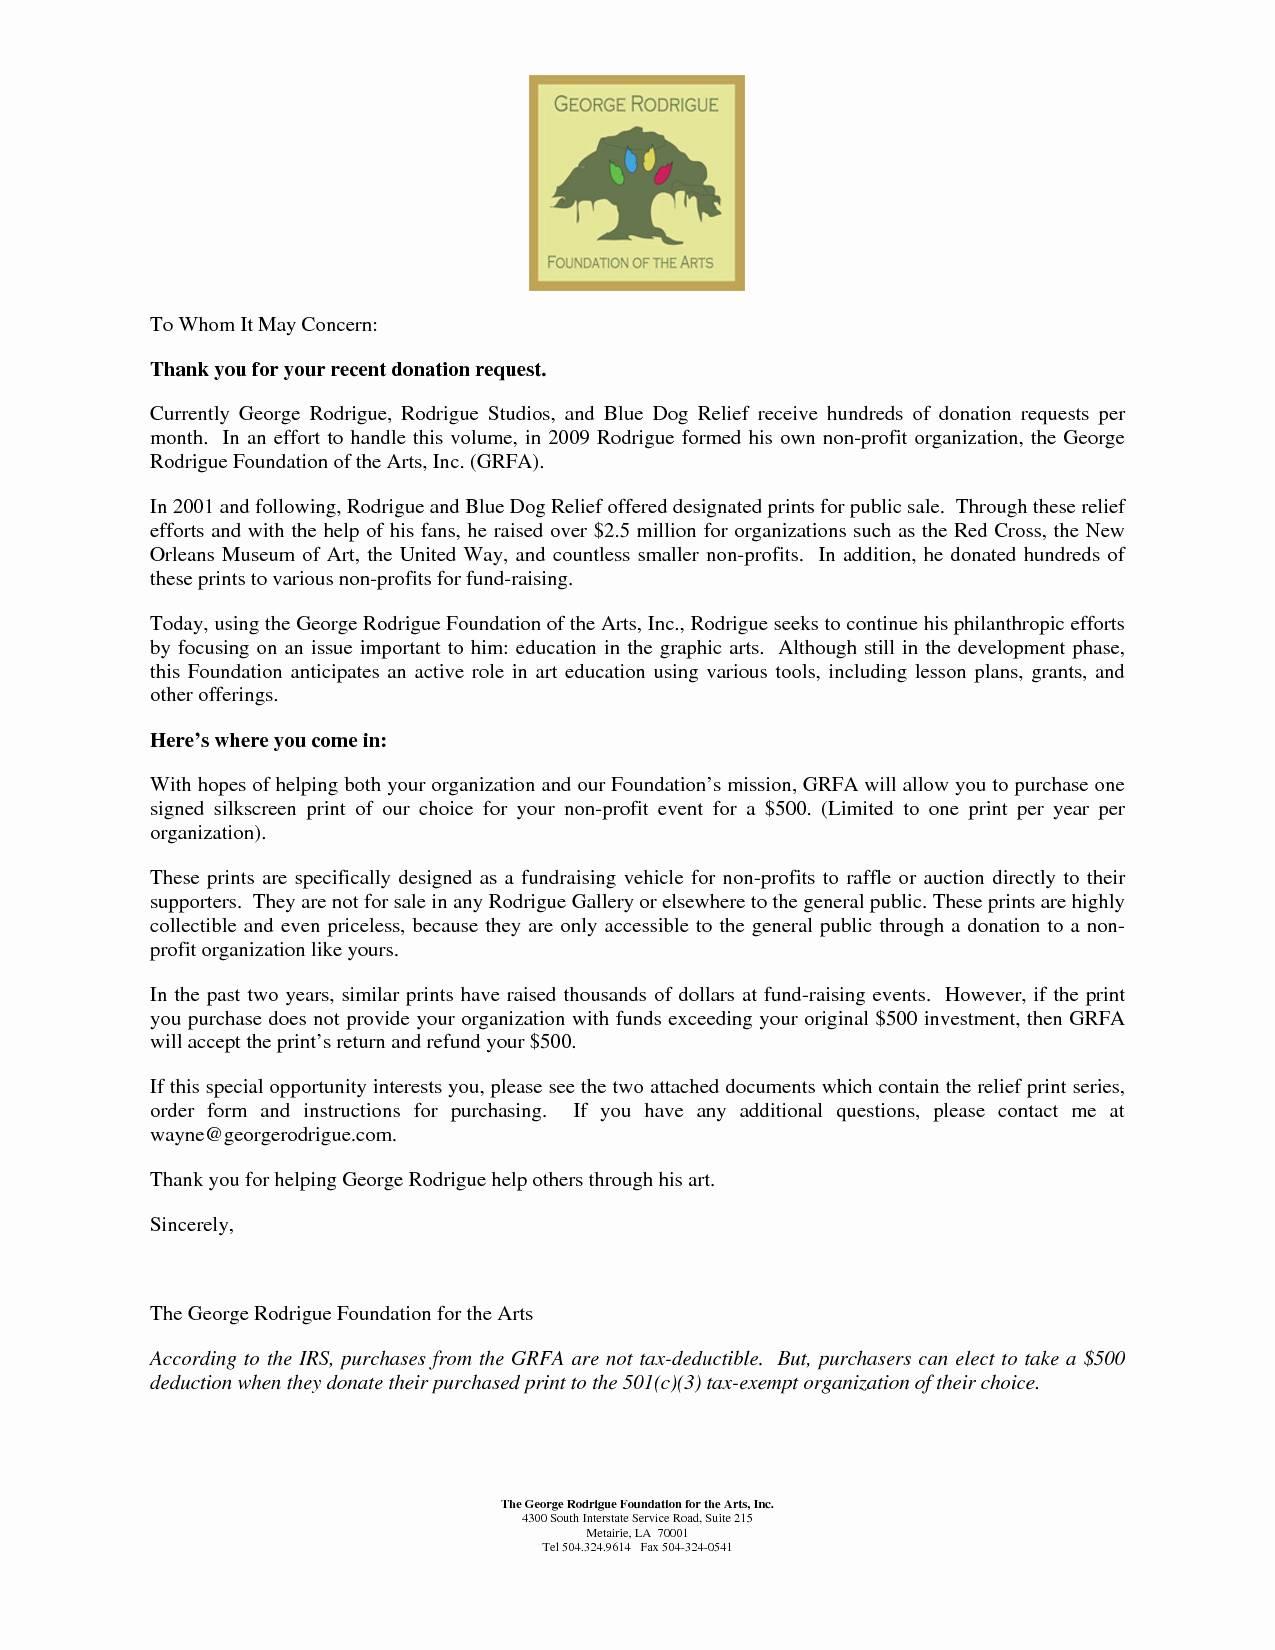 Non Profit Tax Deduction Letter Template - Tax Donation Letter Template Awesome Salvation Army Donation